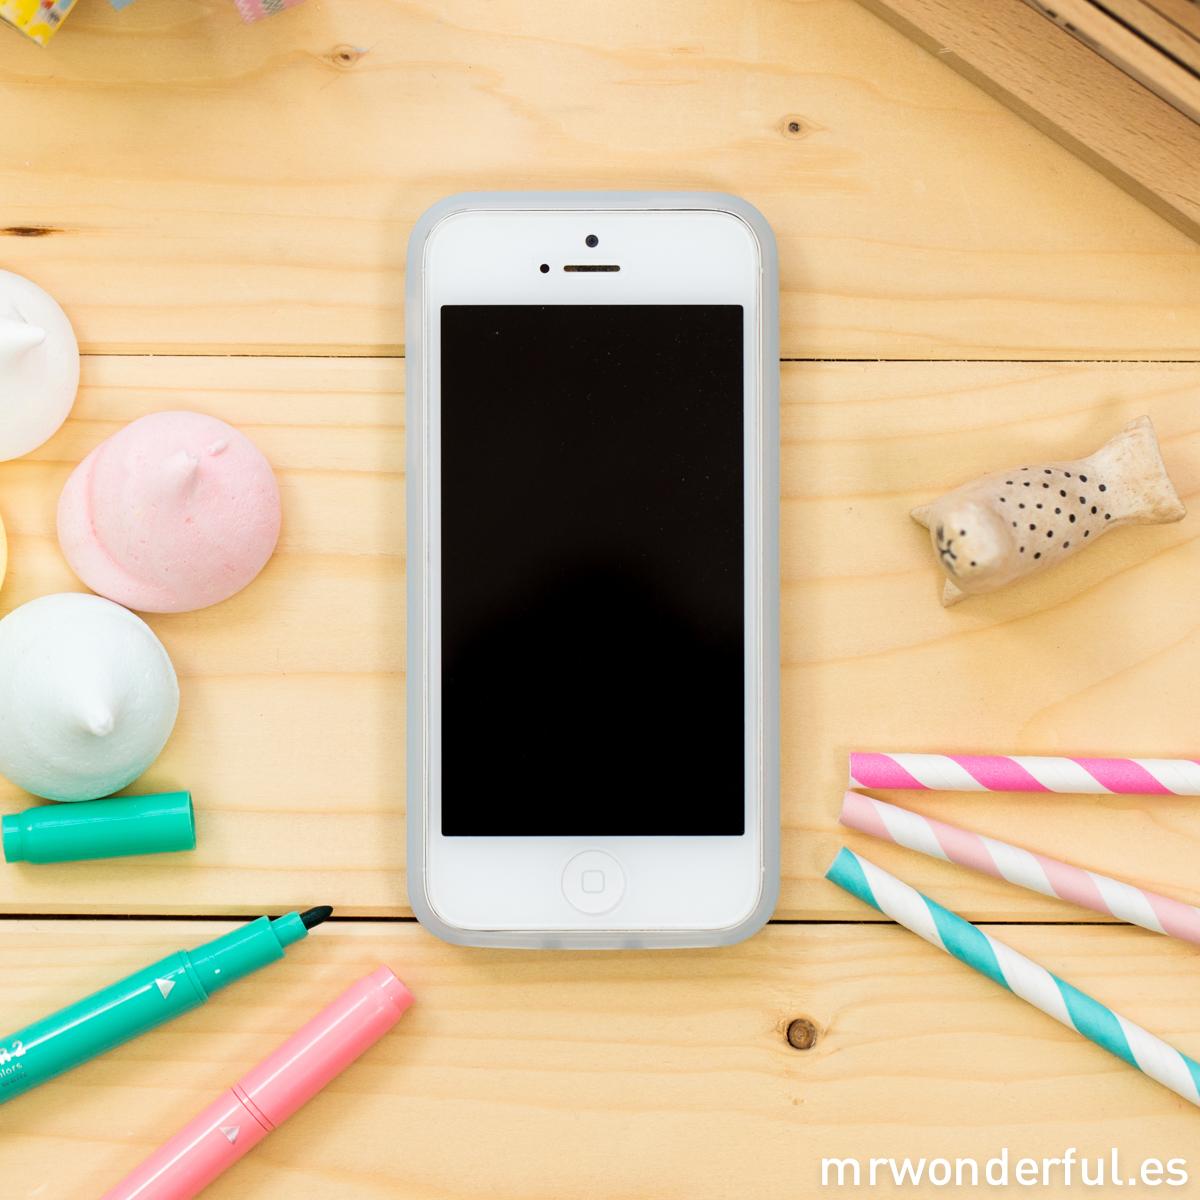 mrwonderful_8436557680099_MRCAR008_carcasa-TPU-iphone-5-5s-new-filtros-MrW-8